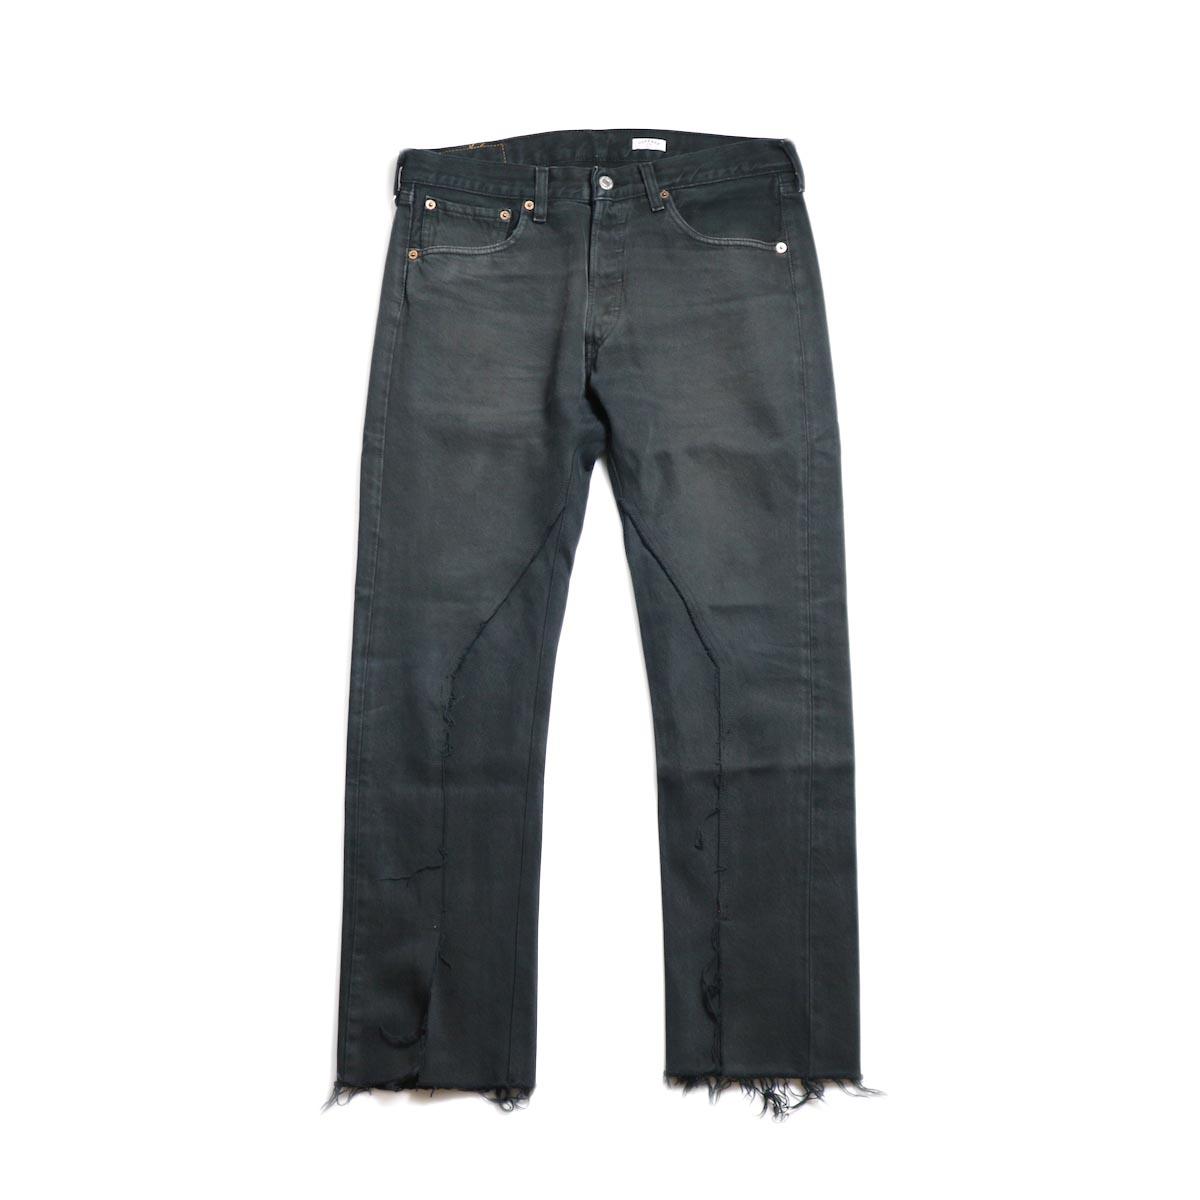 OLD PARK / Slit Jeans -Black Msize (B)